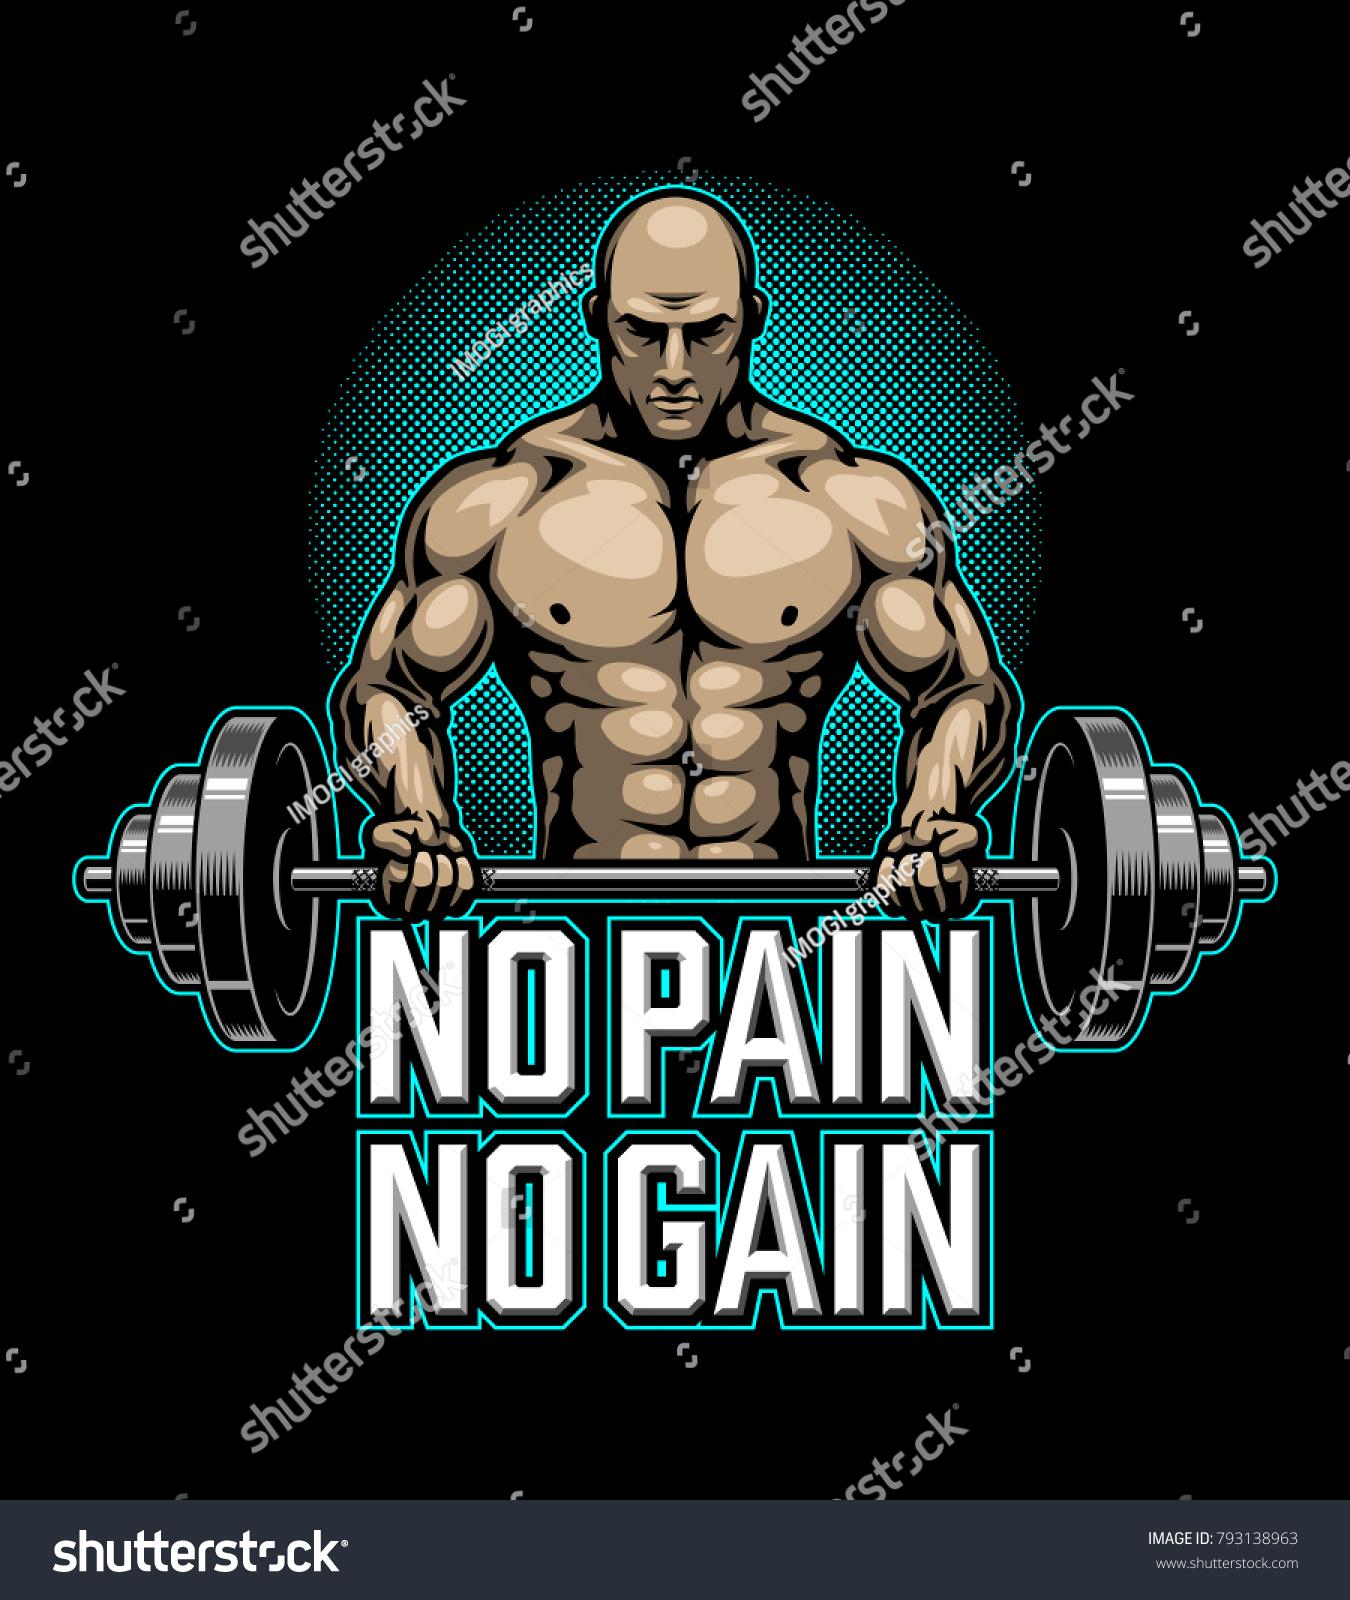 34  Cool Bodybuilding Poster for Bodybuilding Poster Design  104xkb